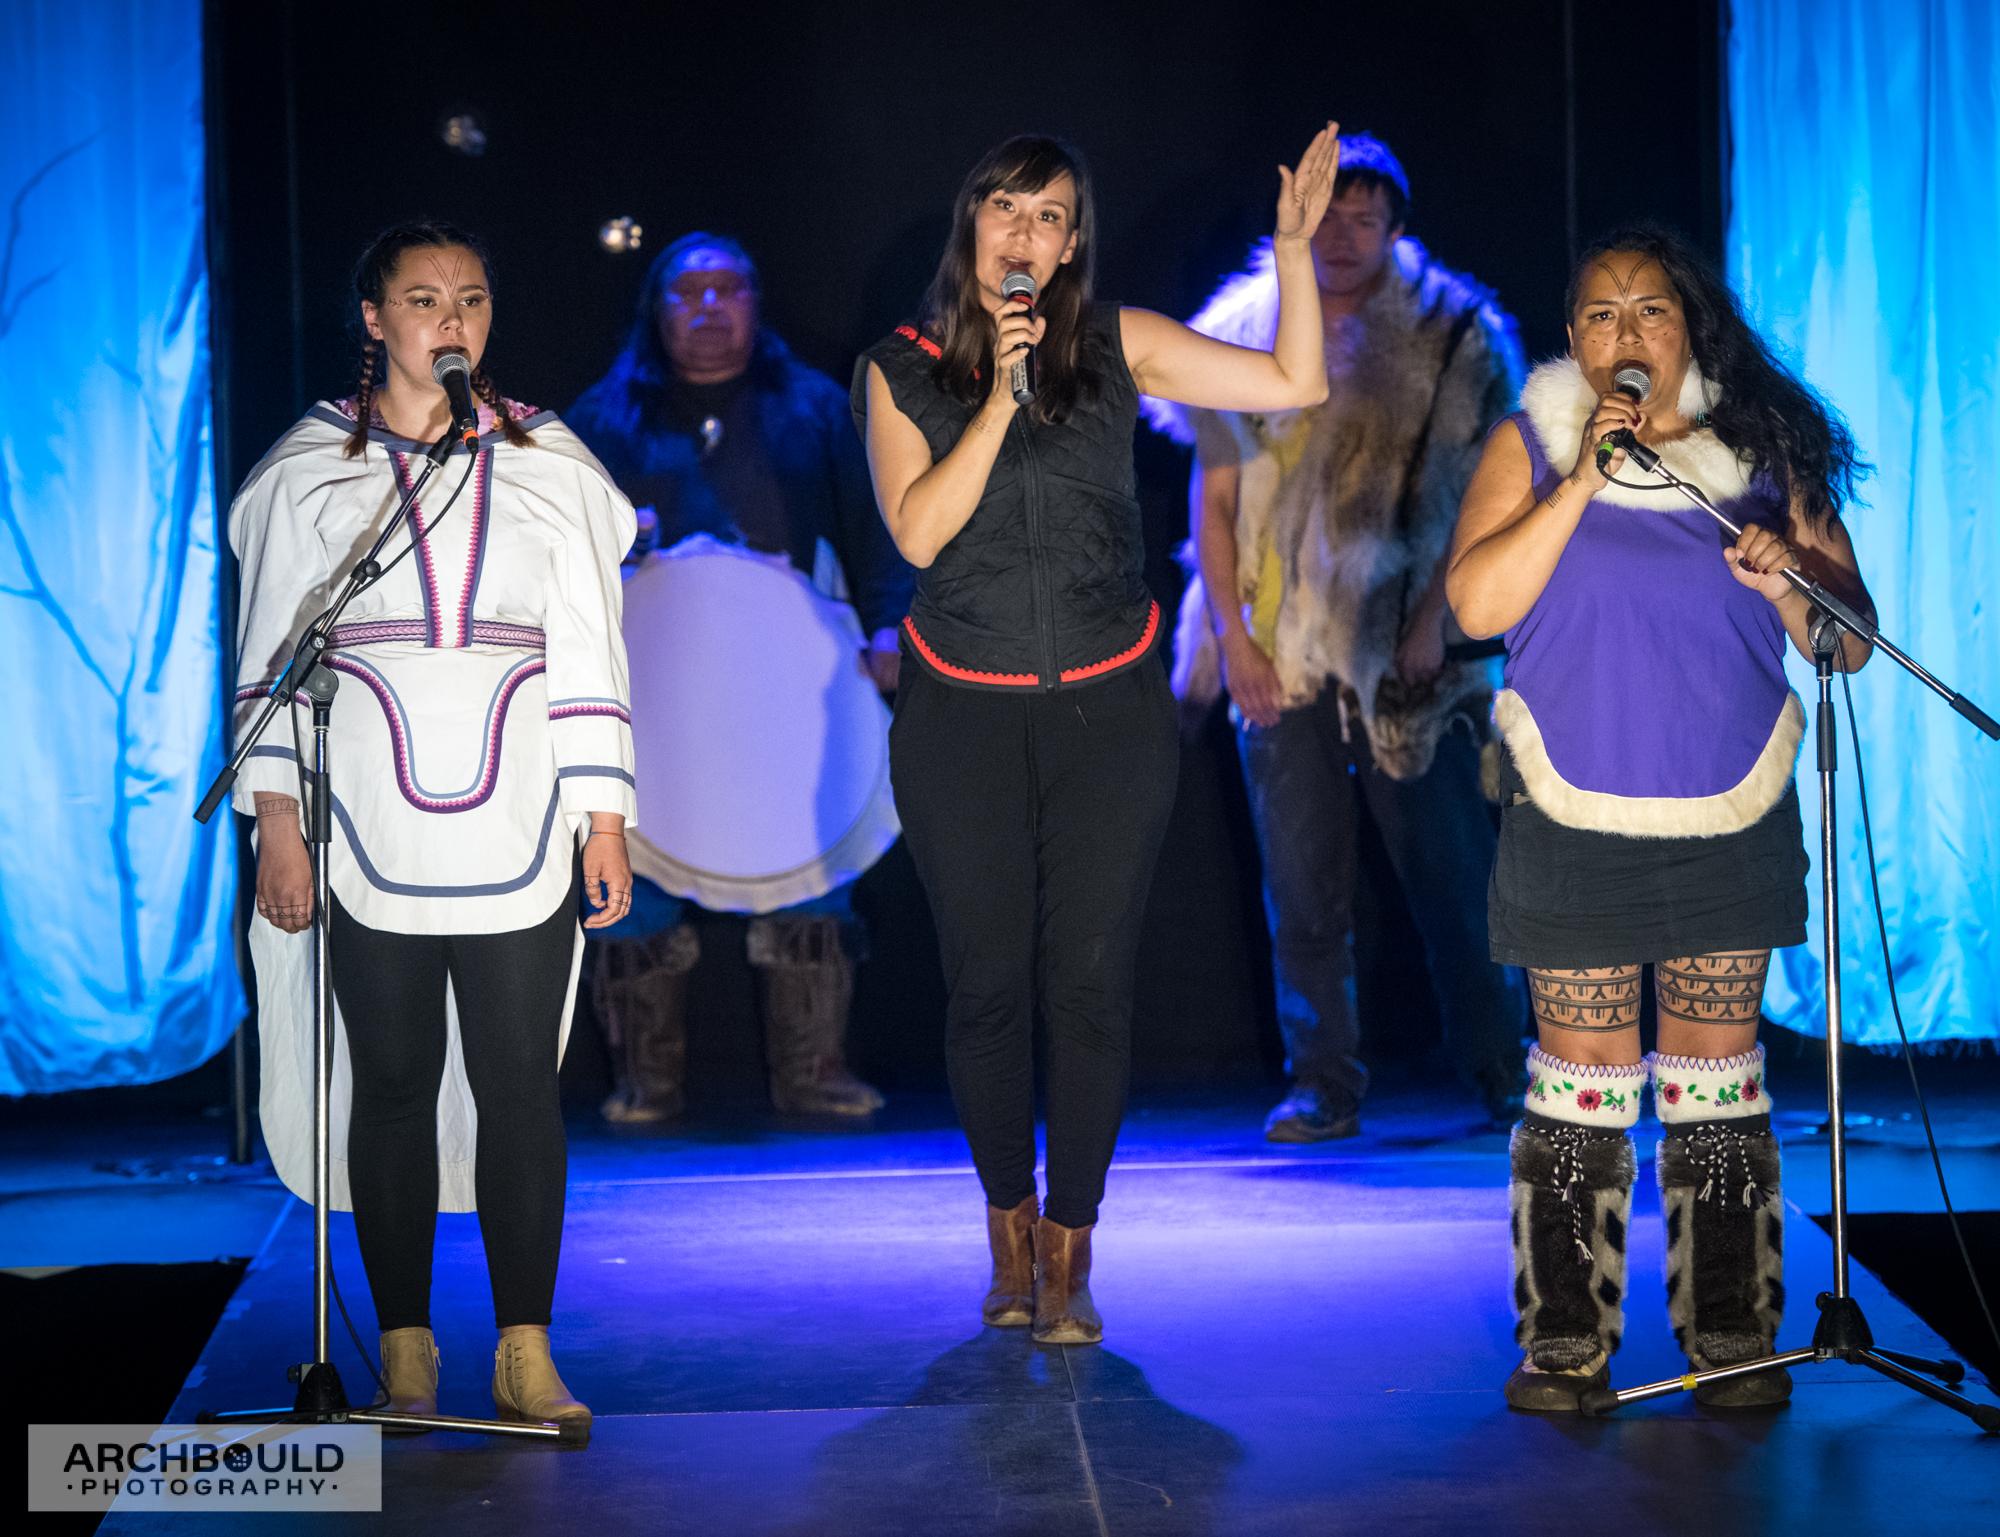 Adäka Circumpolar Collaboration, July 2018, featuring Aasiva (NU), Nive Nielson (GL), Mathew Nuqingaq (NU), Hovak Johnston (NWT) and John Stosh (YT). Photo by Cathie Archbould (courtesy of Adäka Cultural Festival).